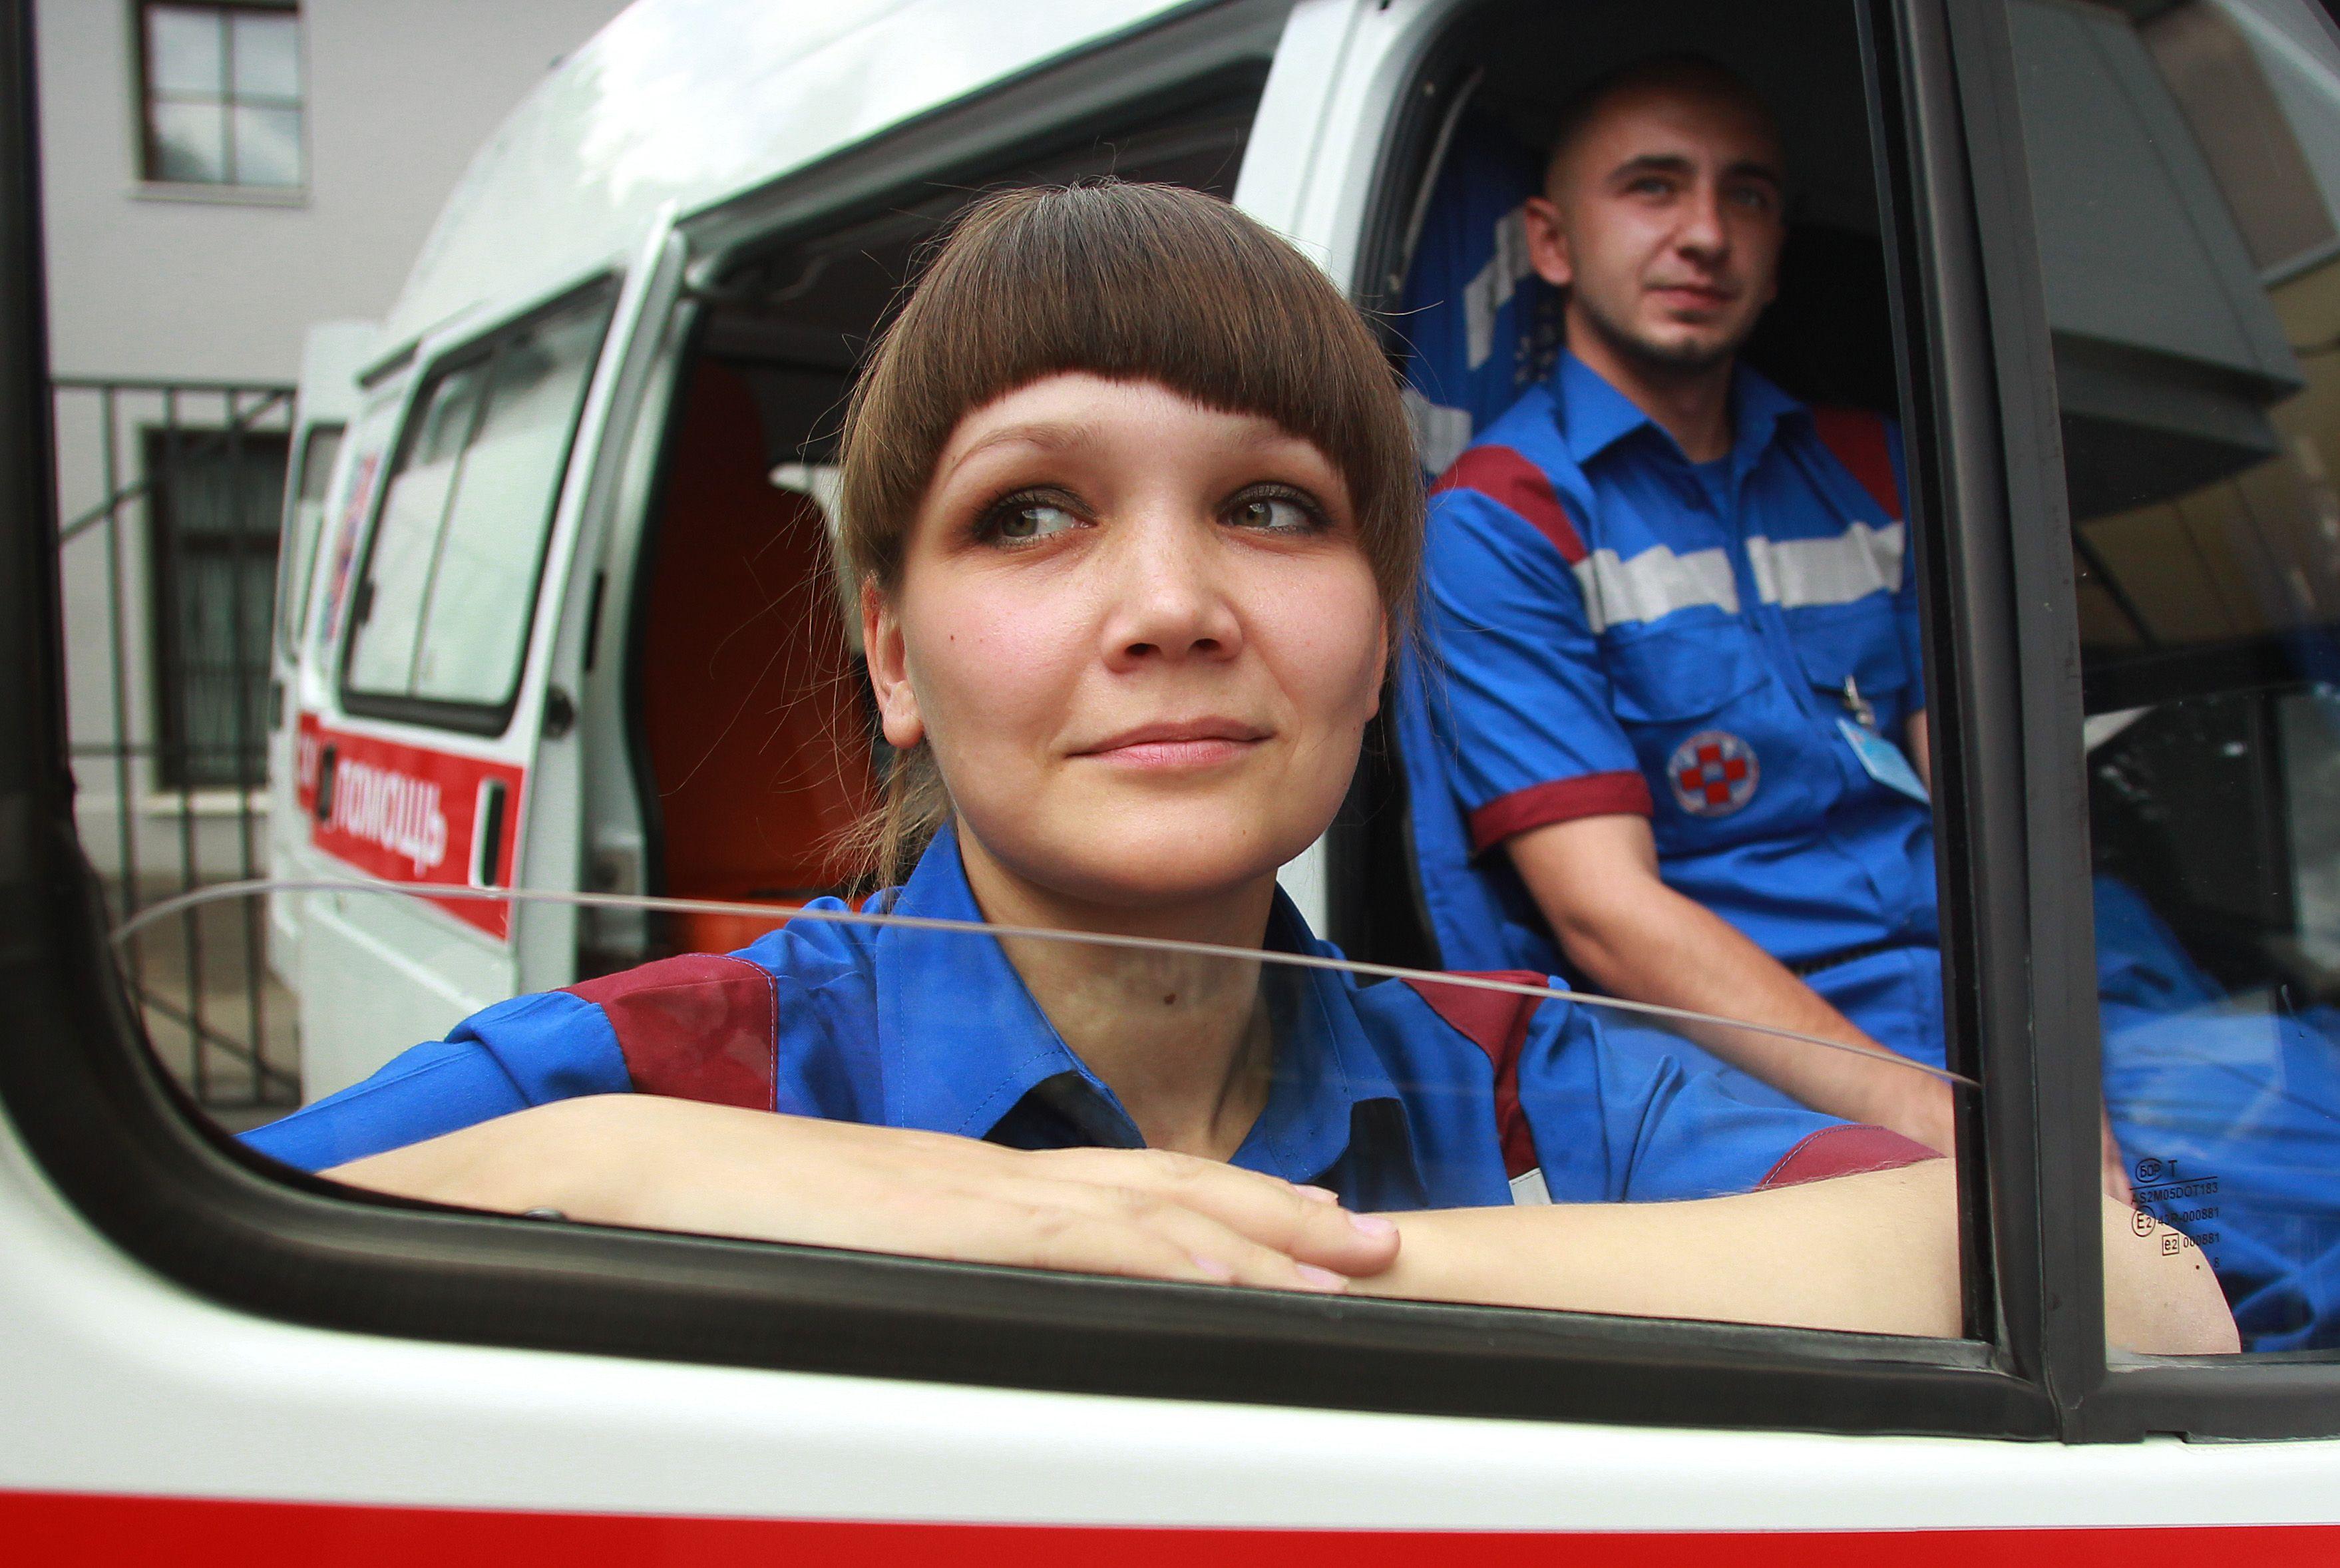 Москвичи оценили арт-объект для благодарности врачам скорой помощи